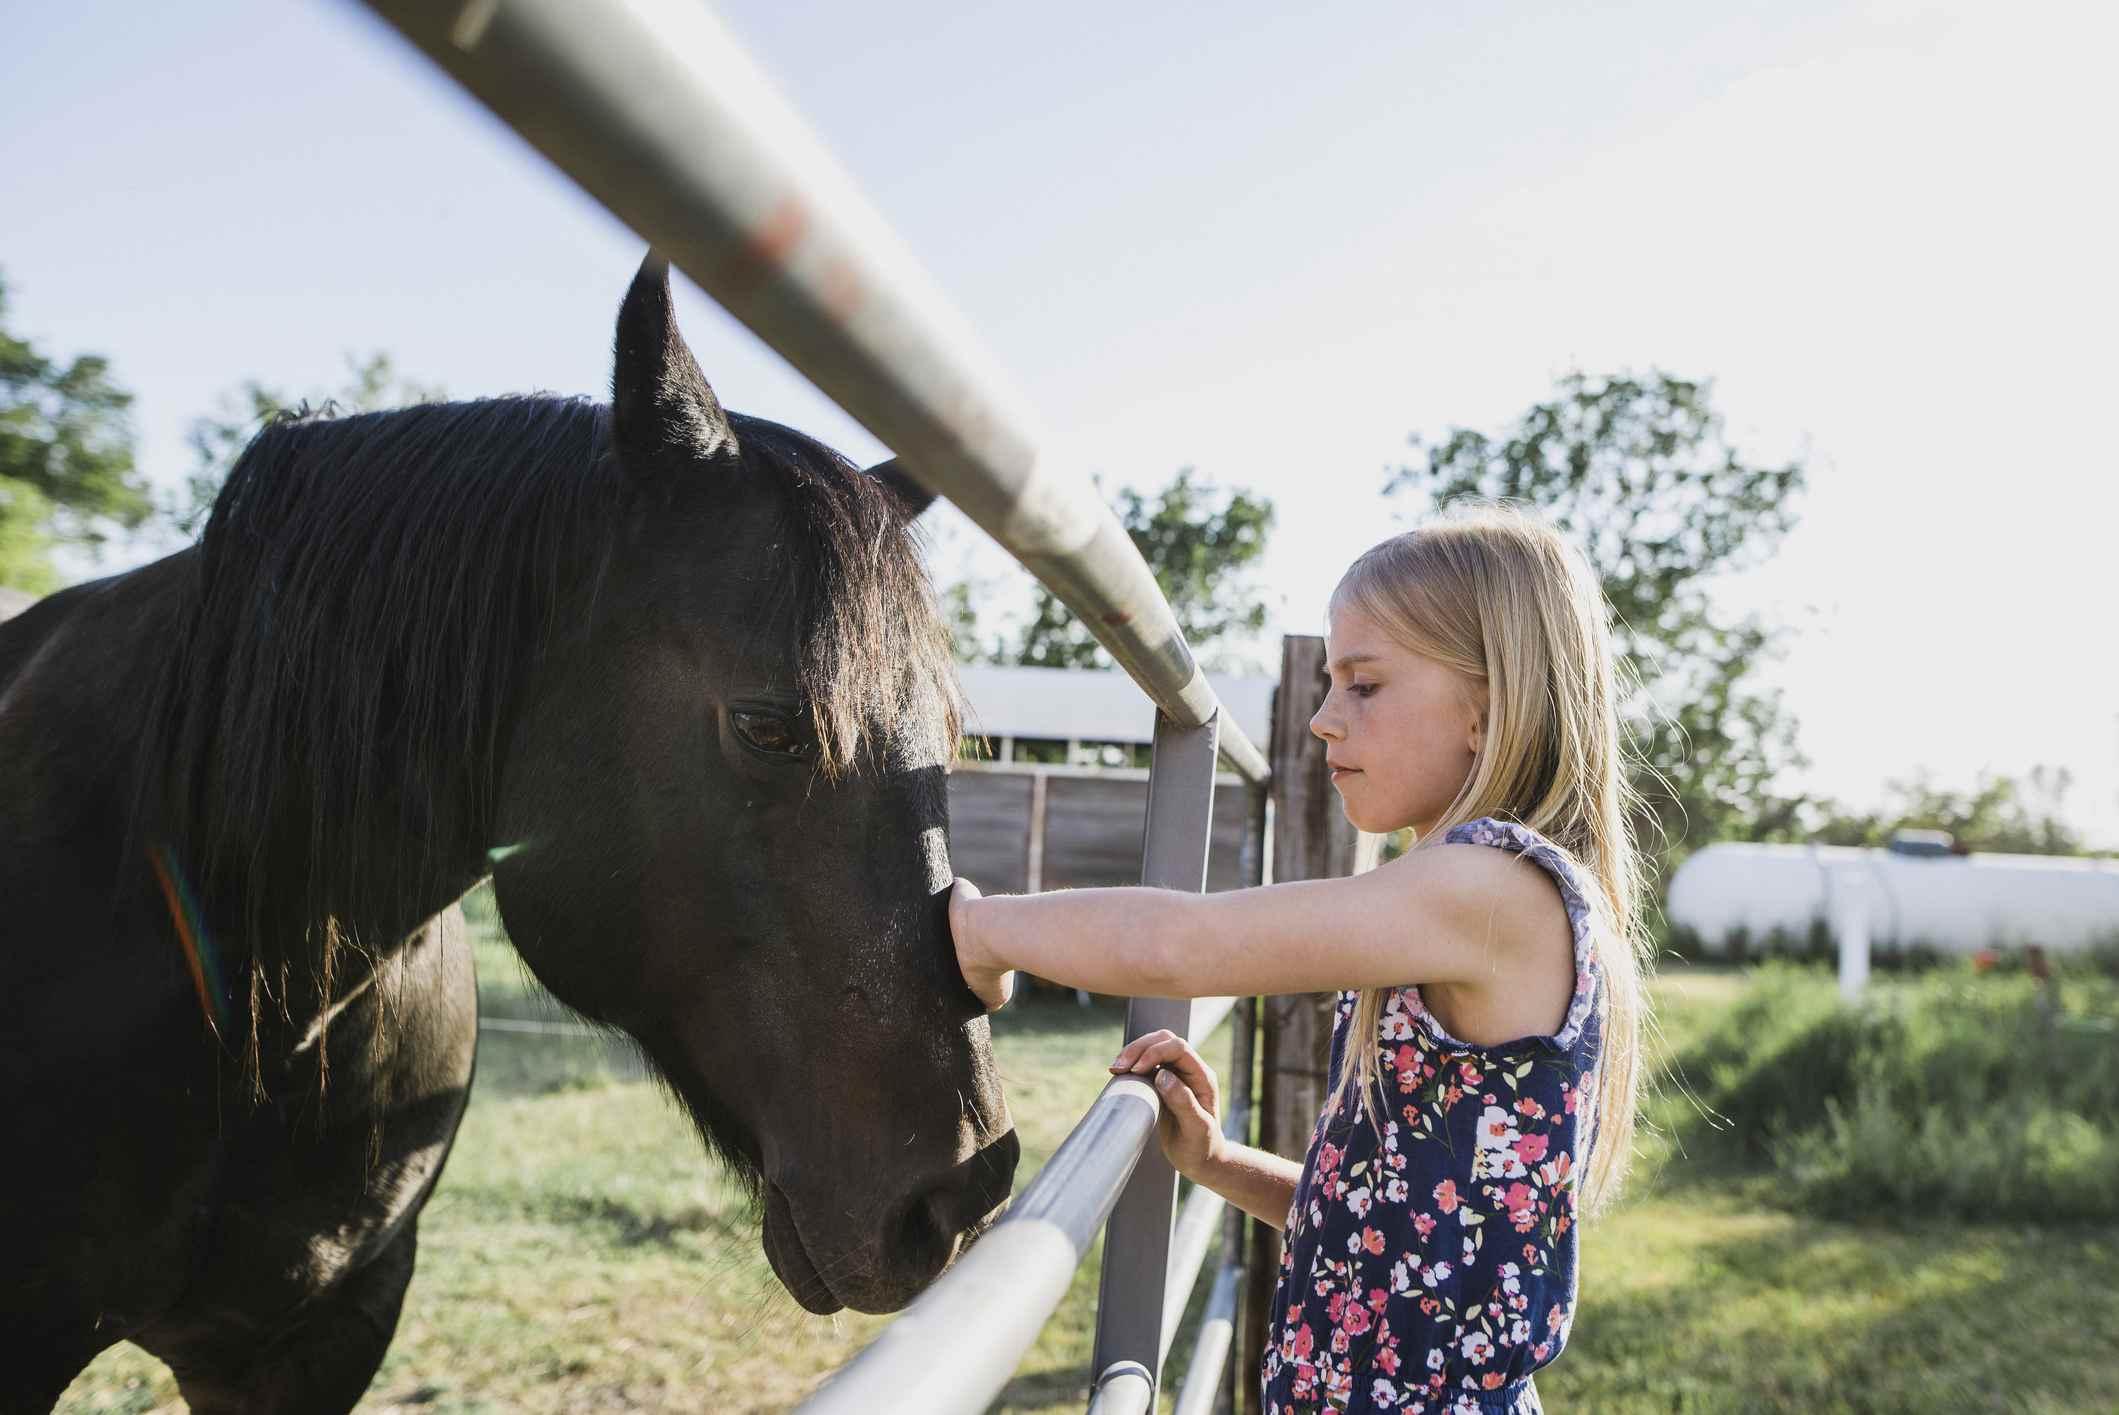 Girl petting horse through fence